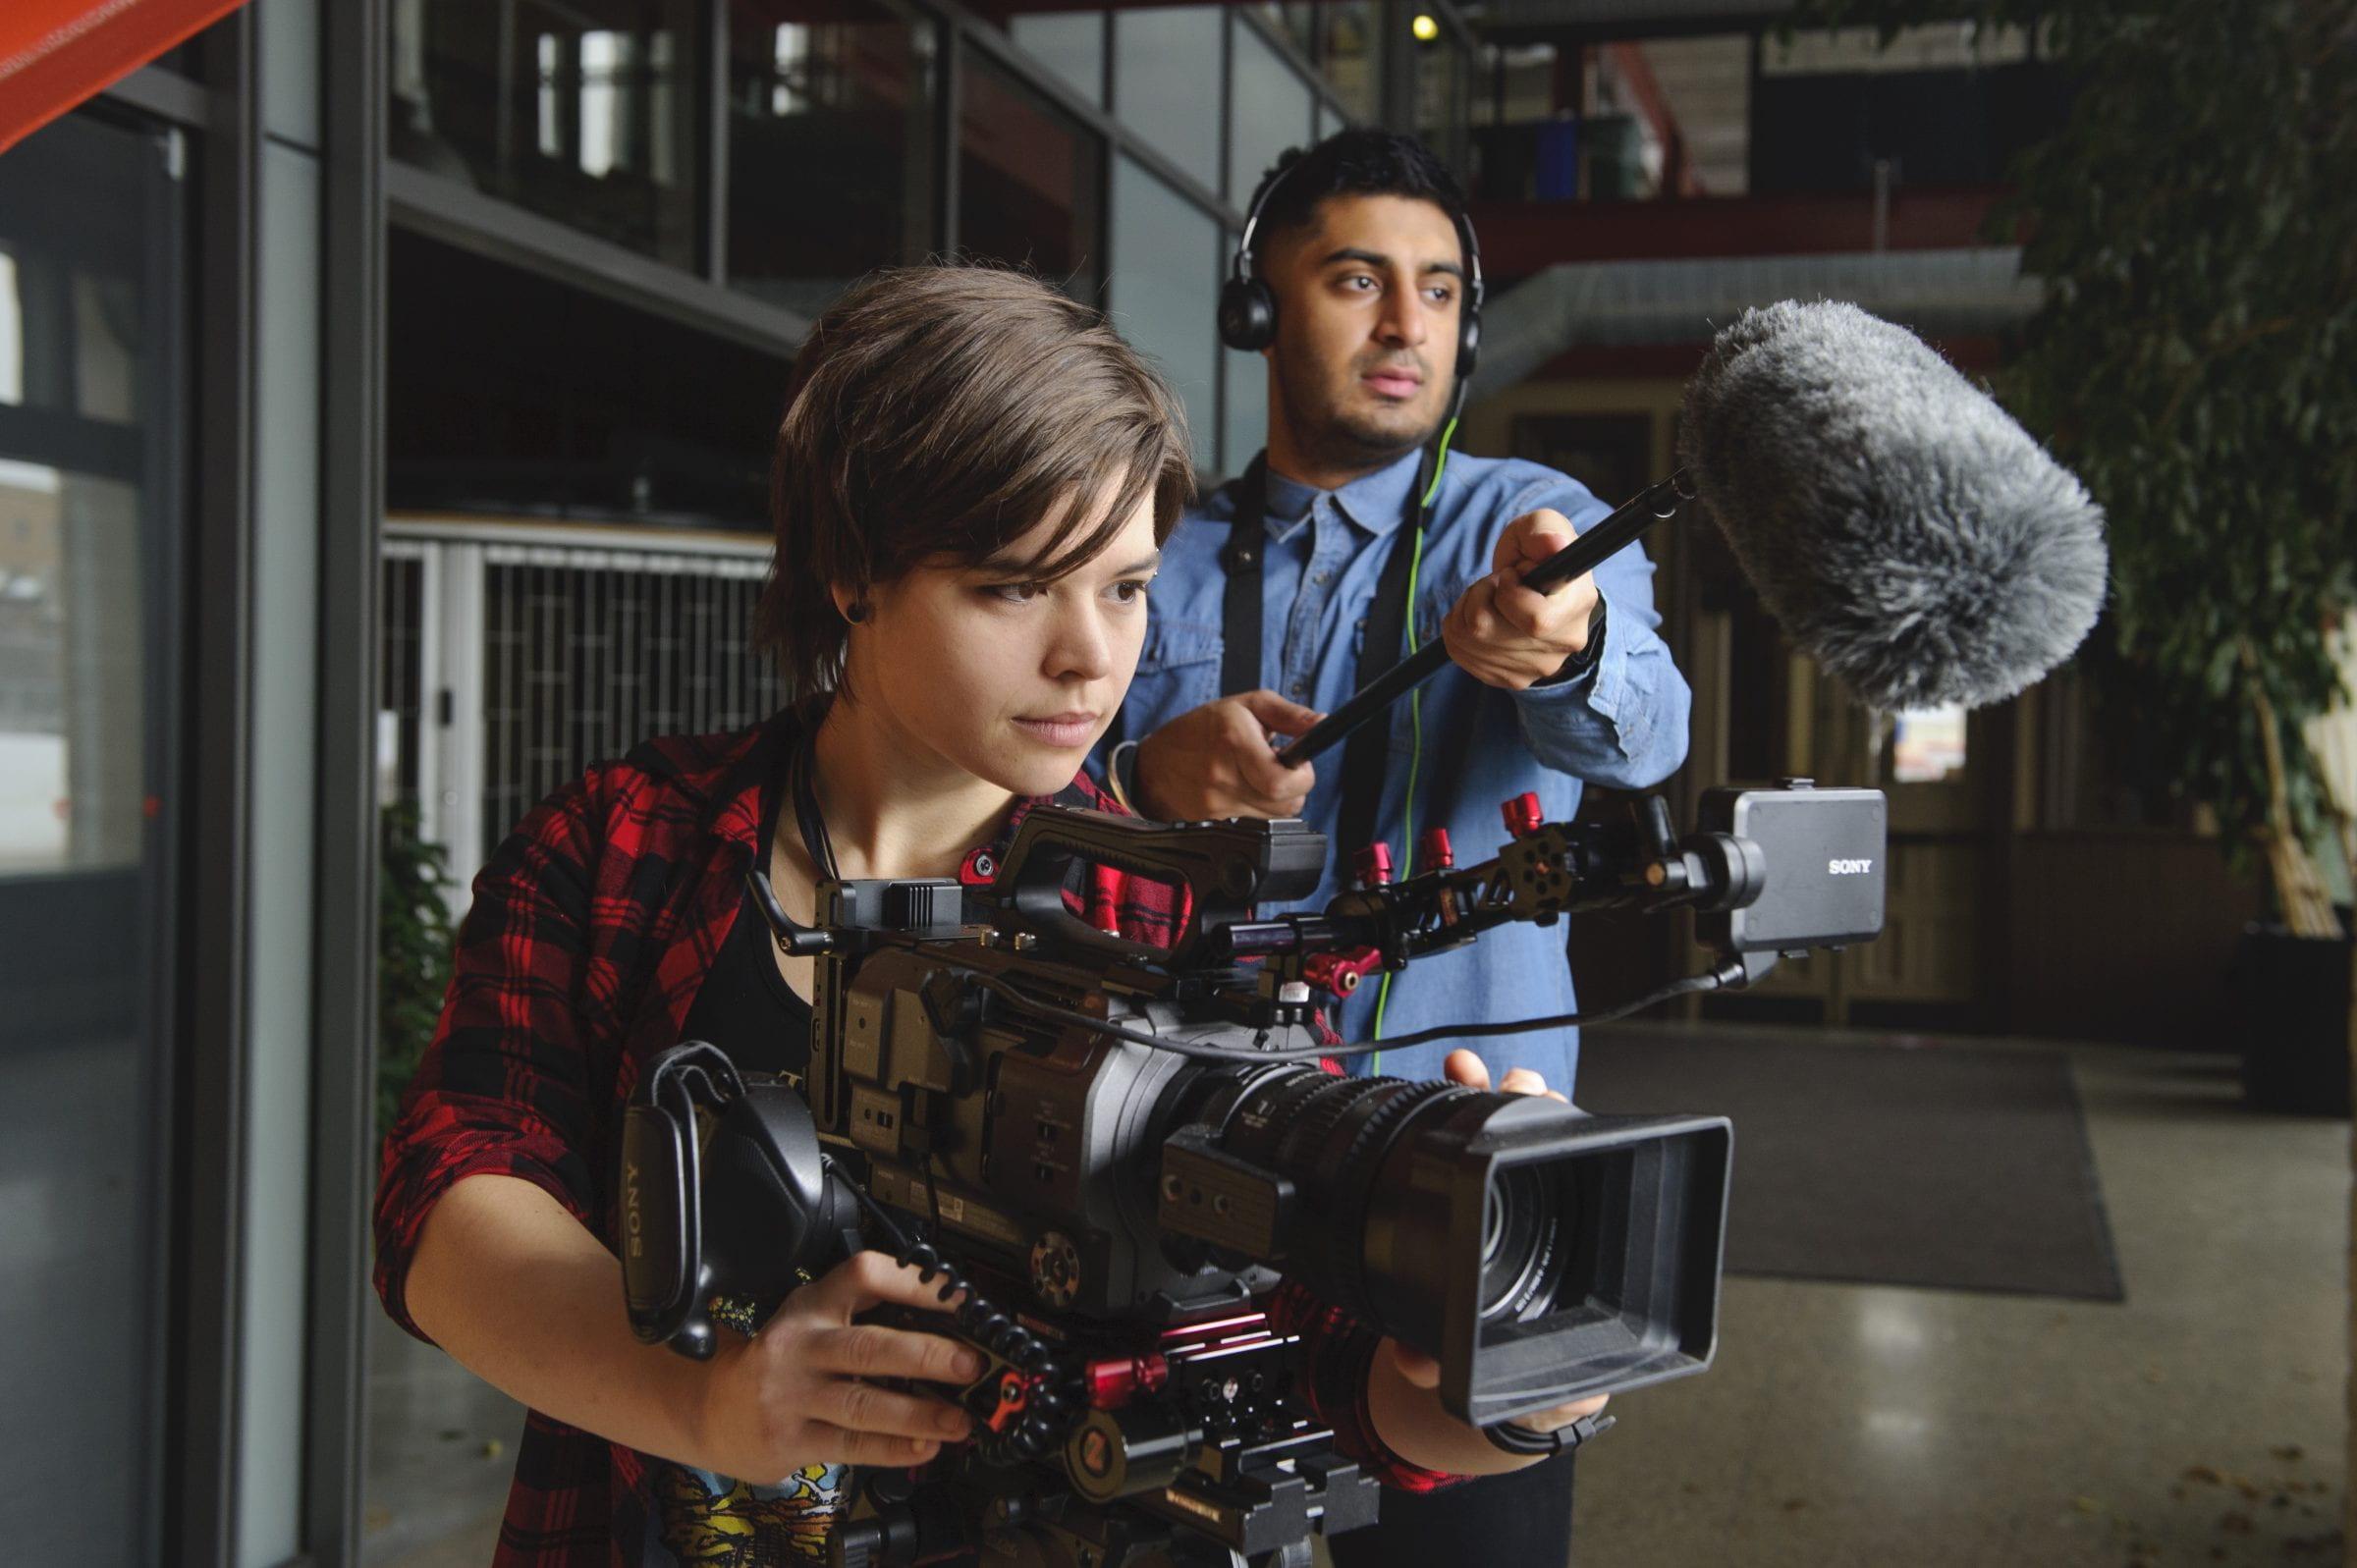 RRC Polytech grads use cutting-edge film equipment